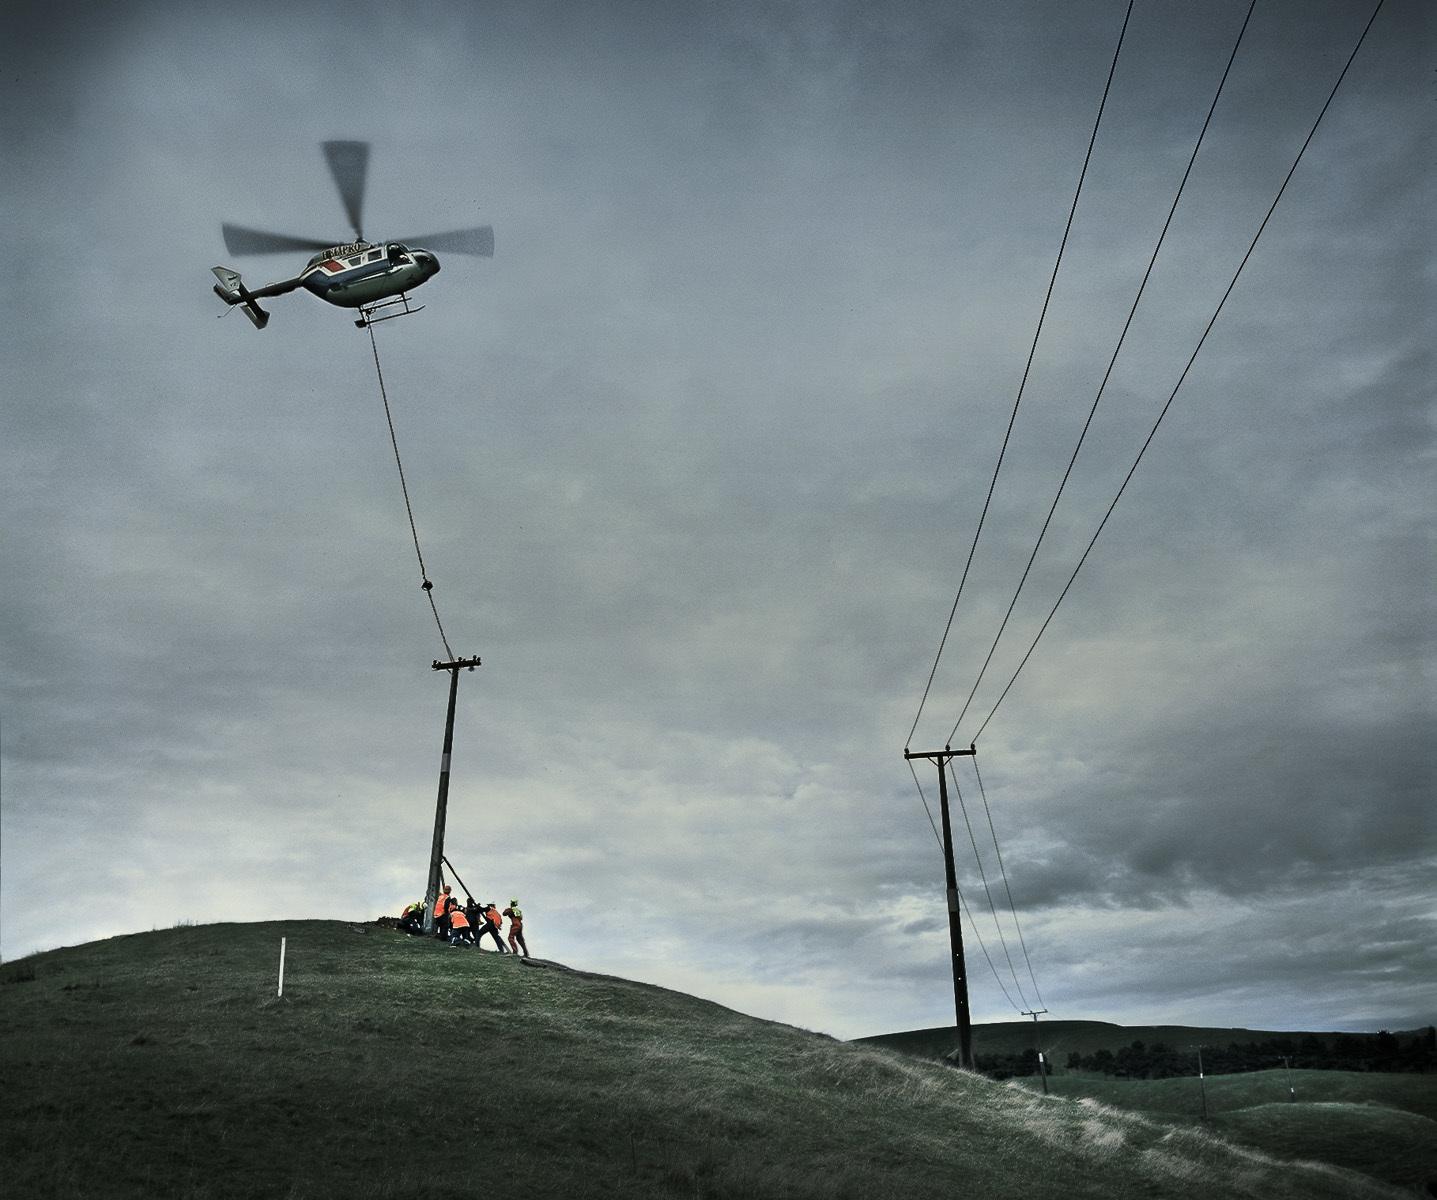 Helicopter & pylon